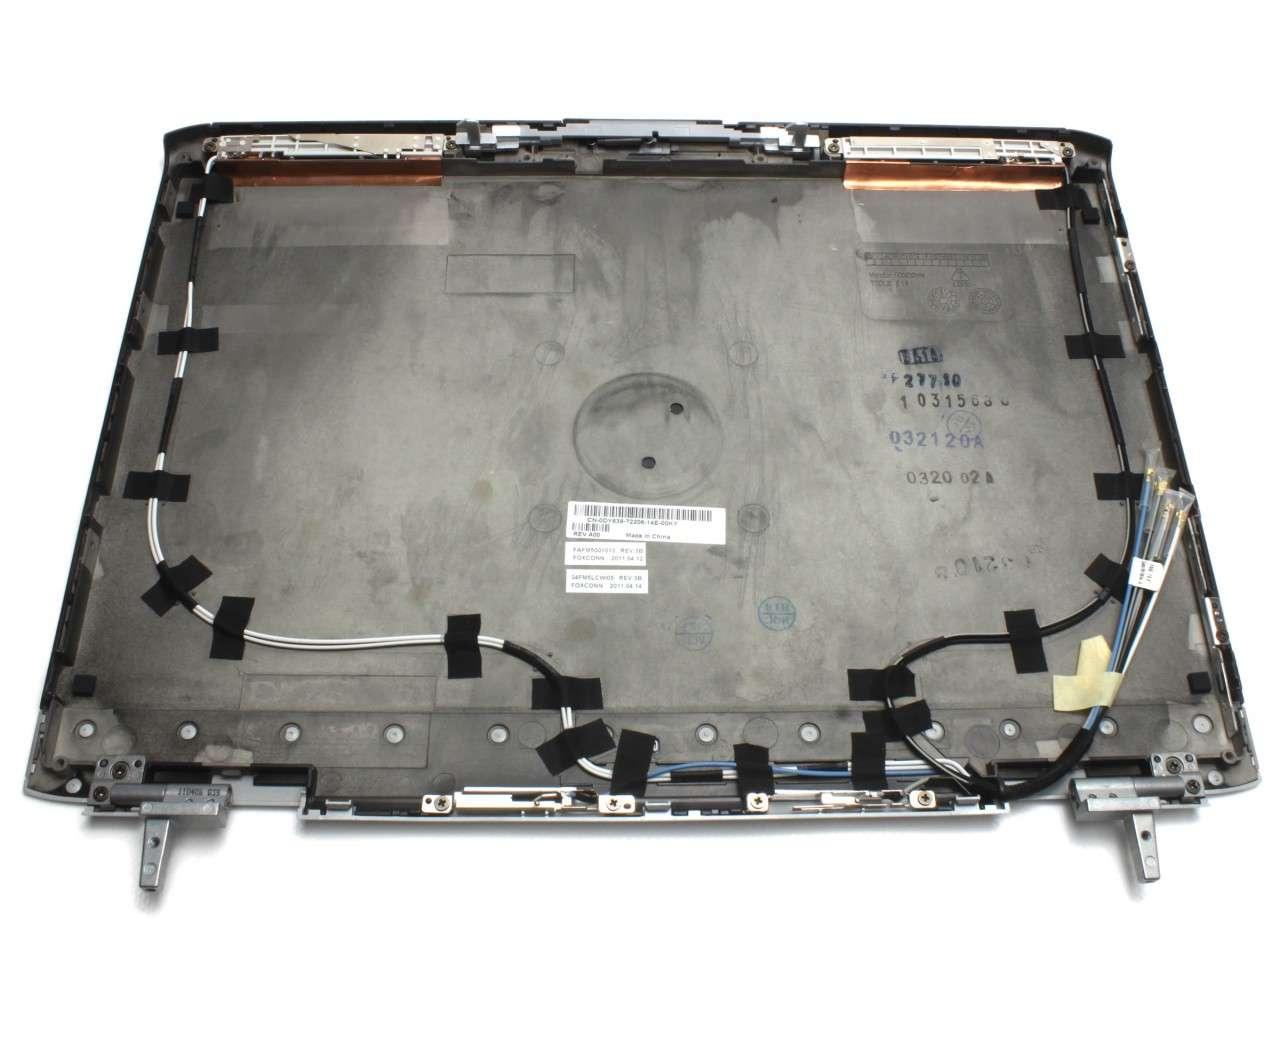 Capac Display BackCover Dell FAFM5001013 Carcasa Display imagine powerlaptop.ro 2021